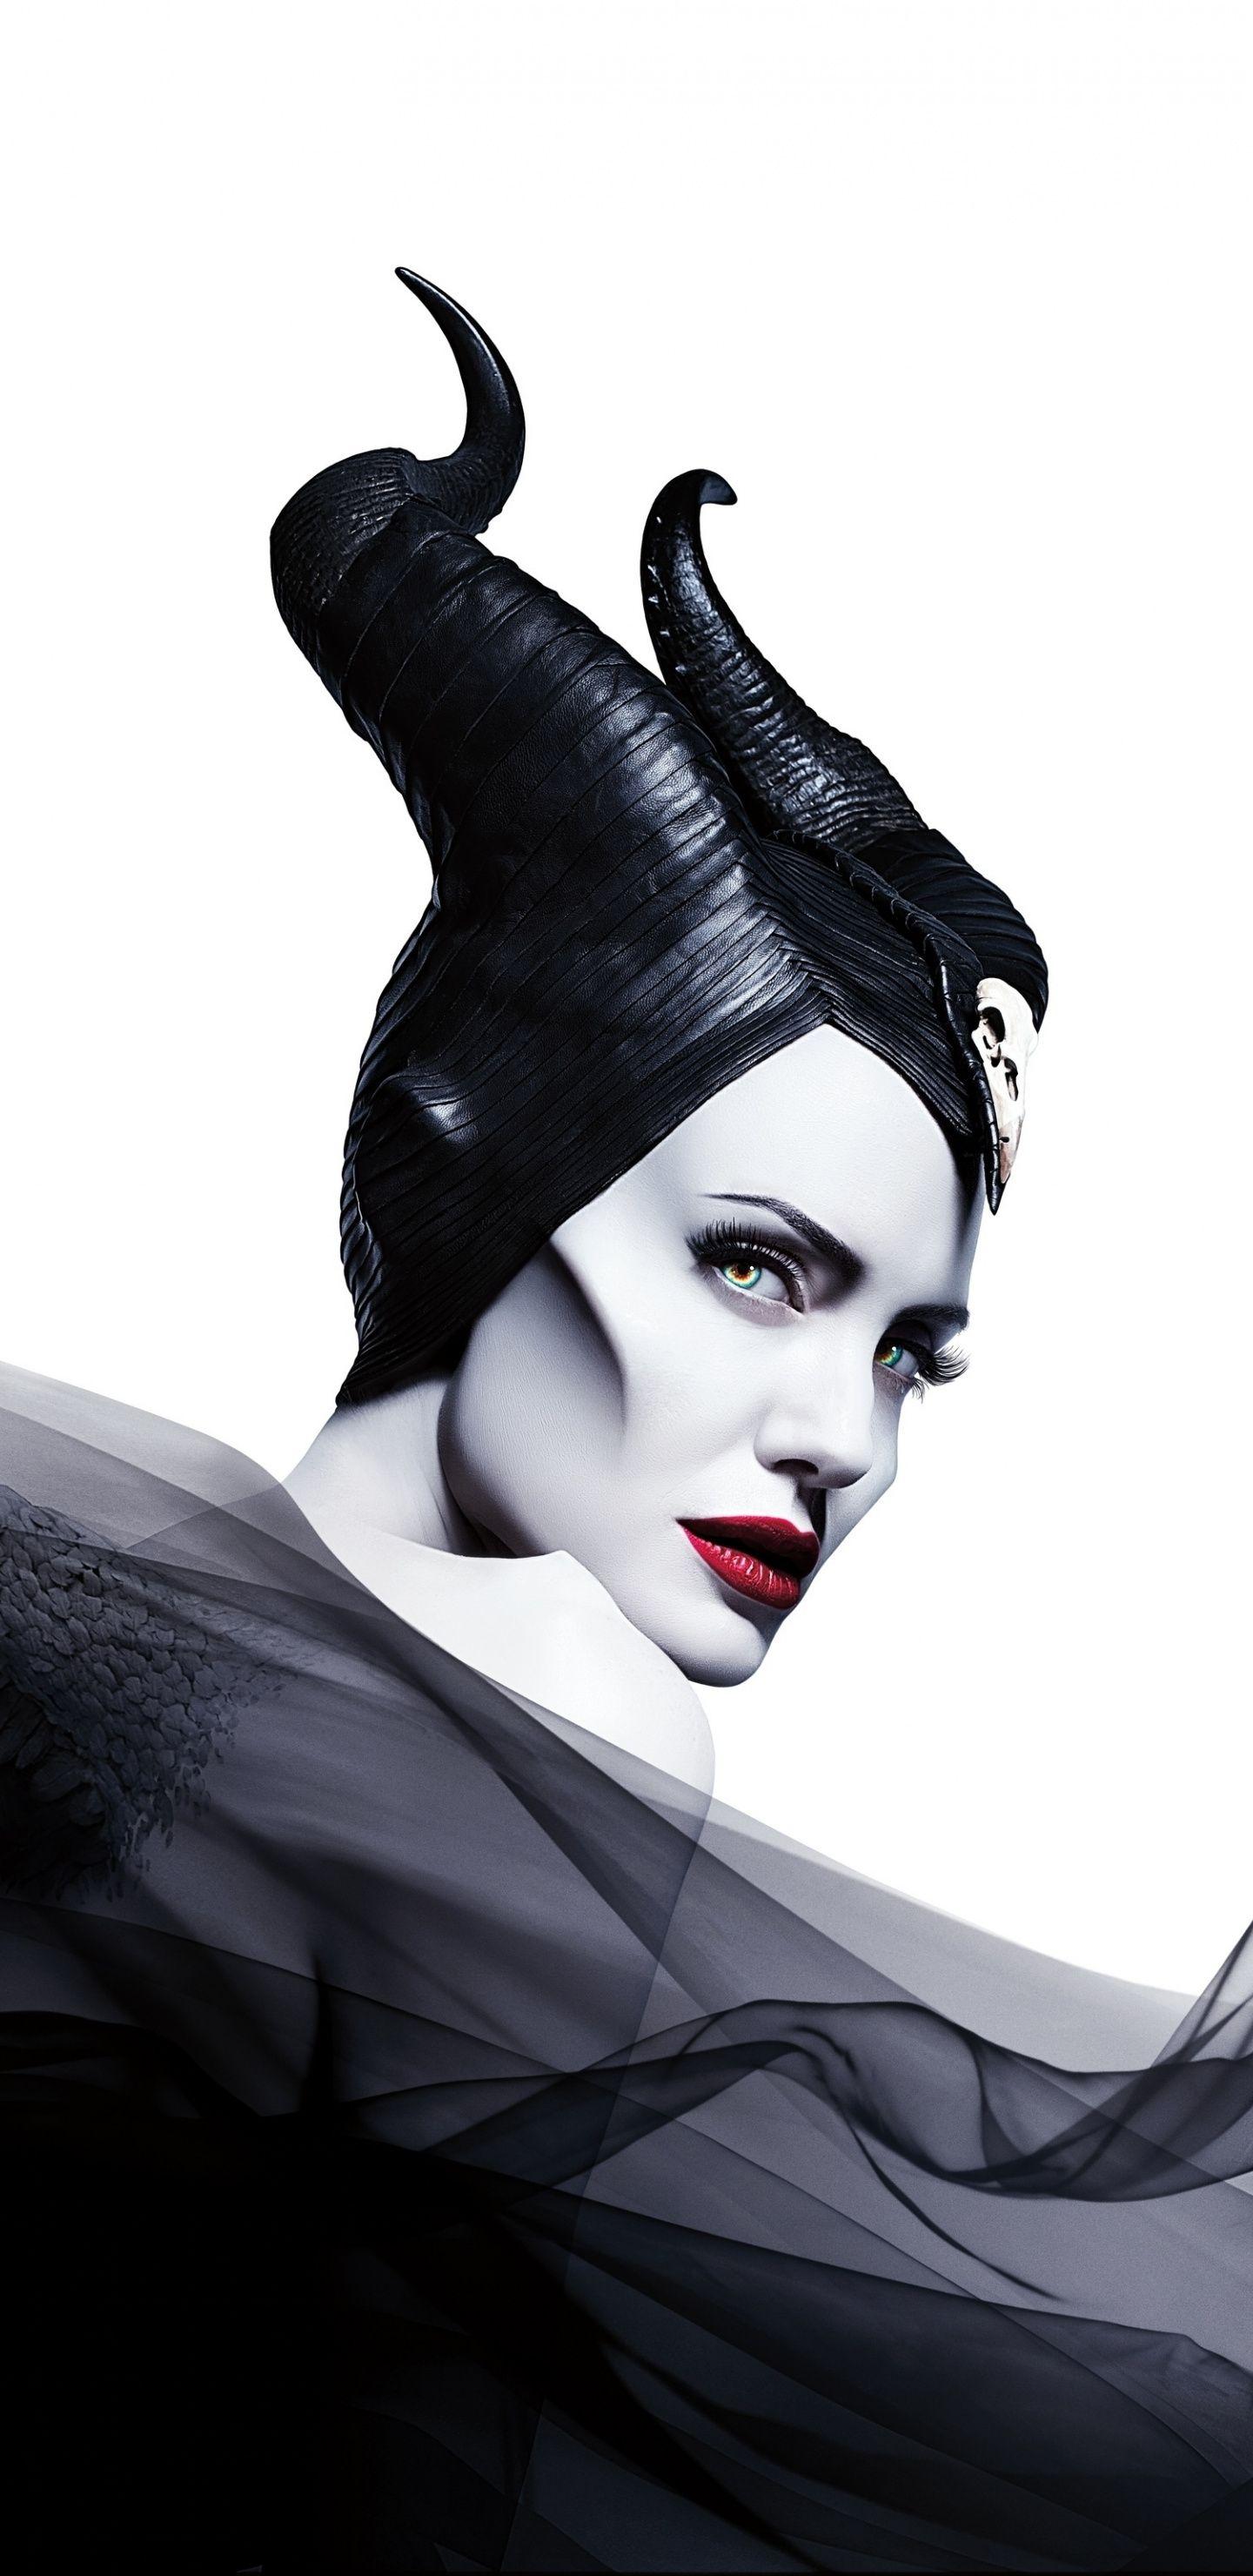 1440x2960 Maleficent Mistress Of Evil Angelina Jolie Evil